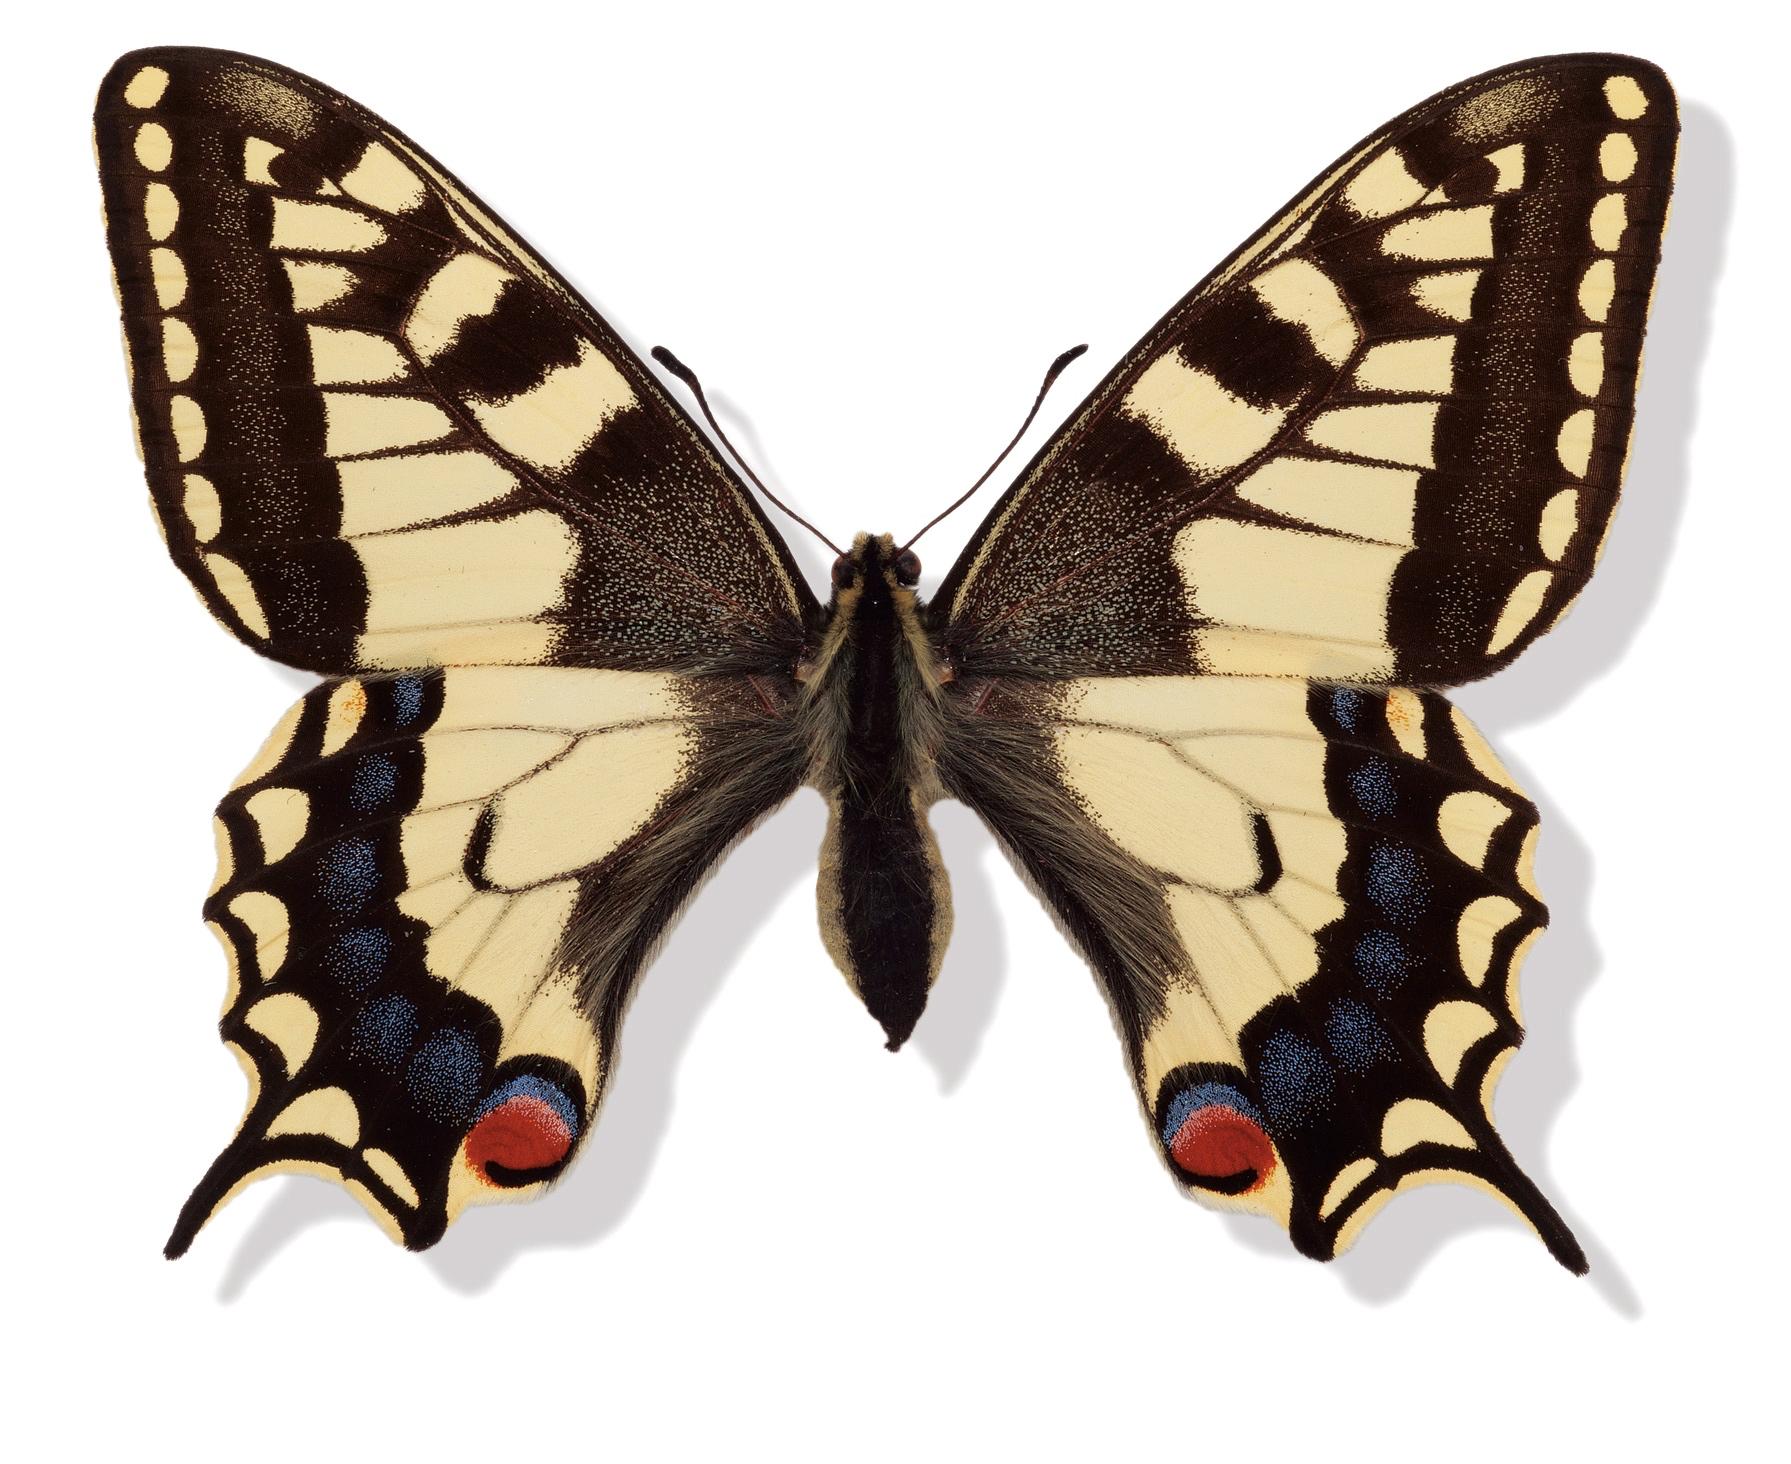 Svalehale Papilio machaon